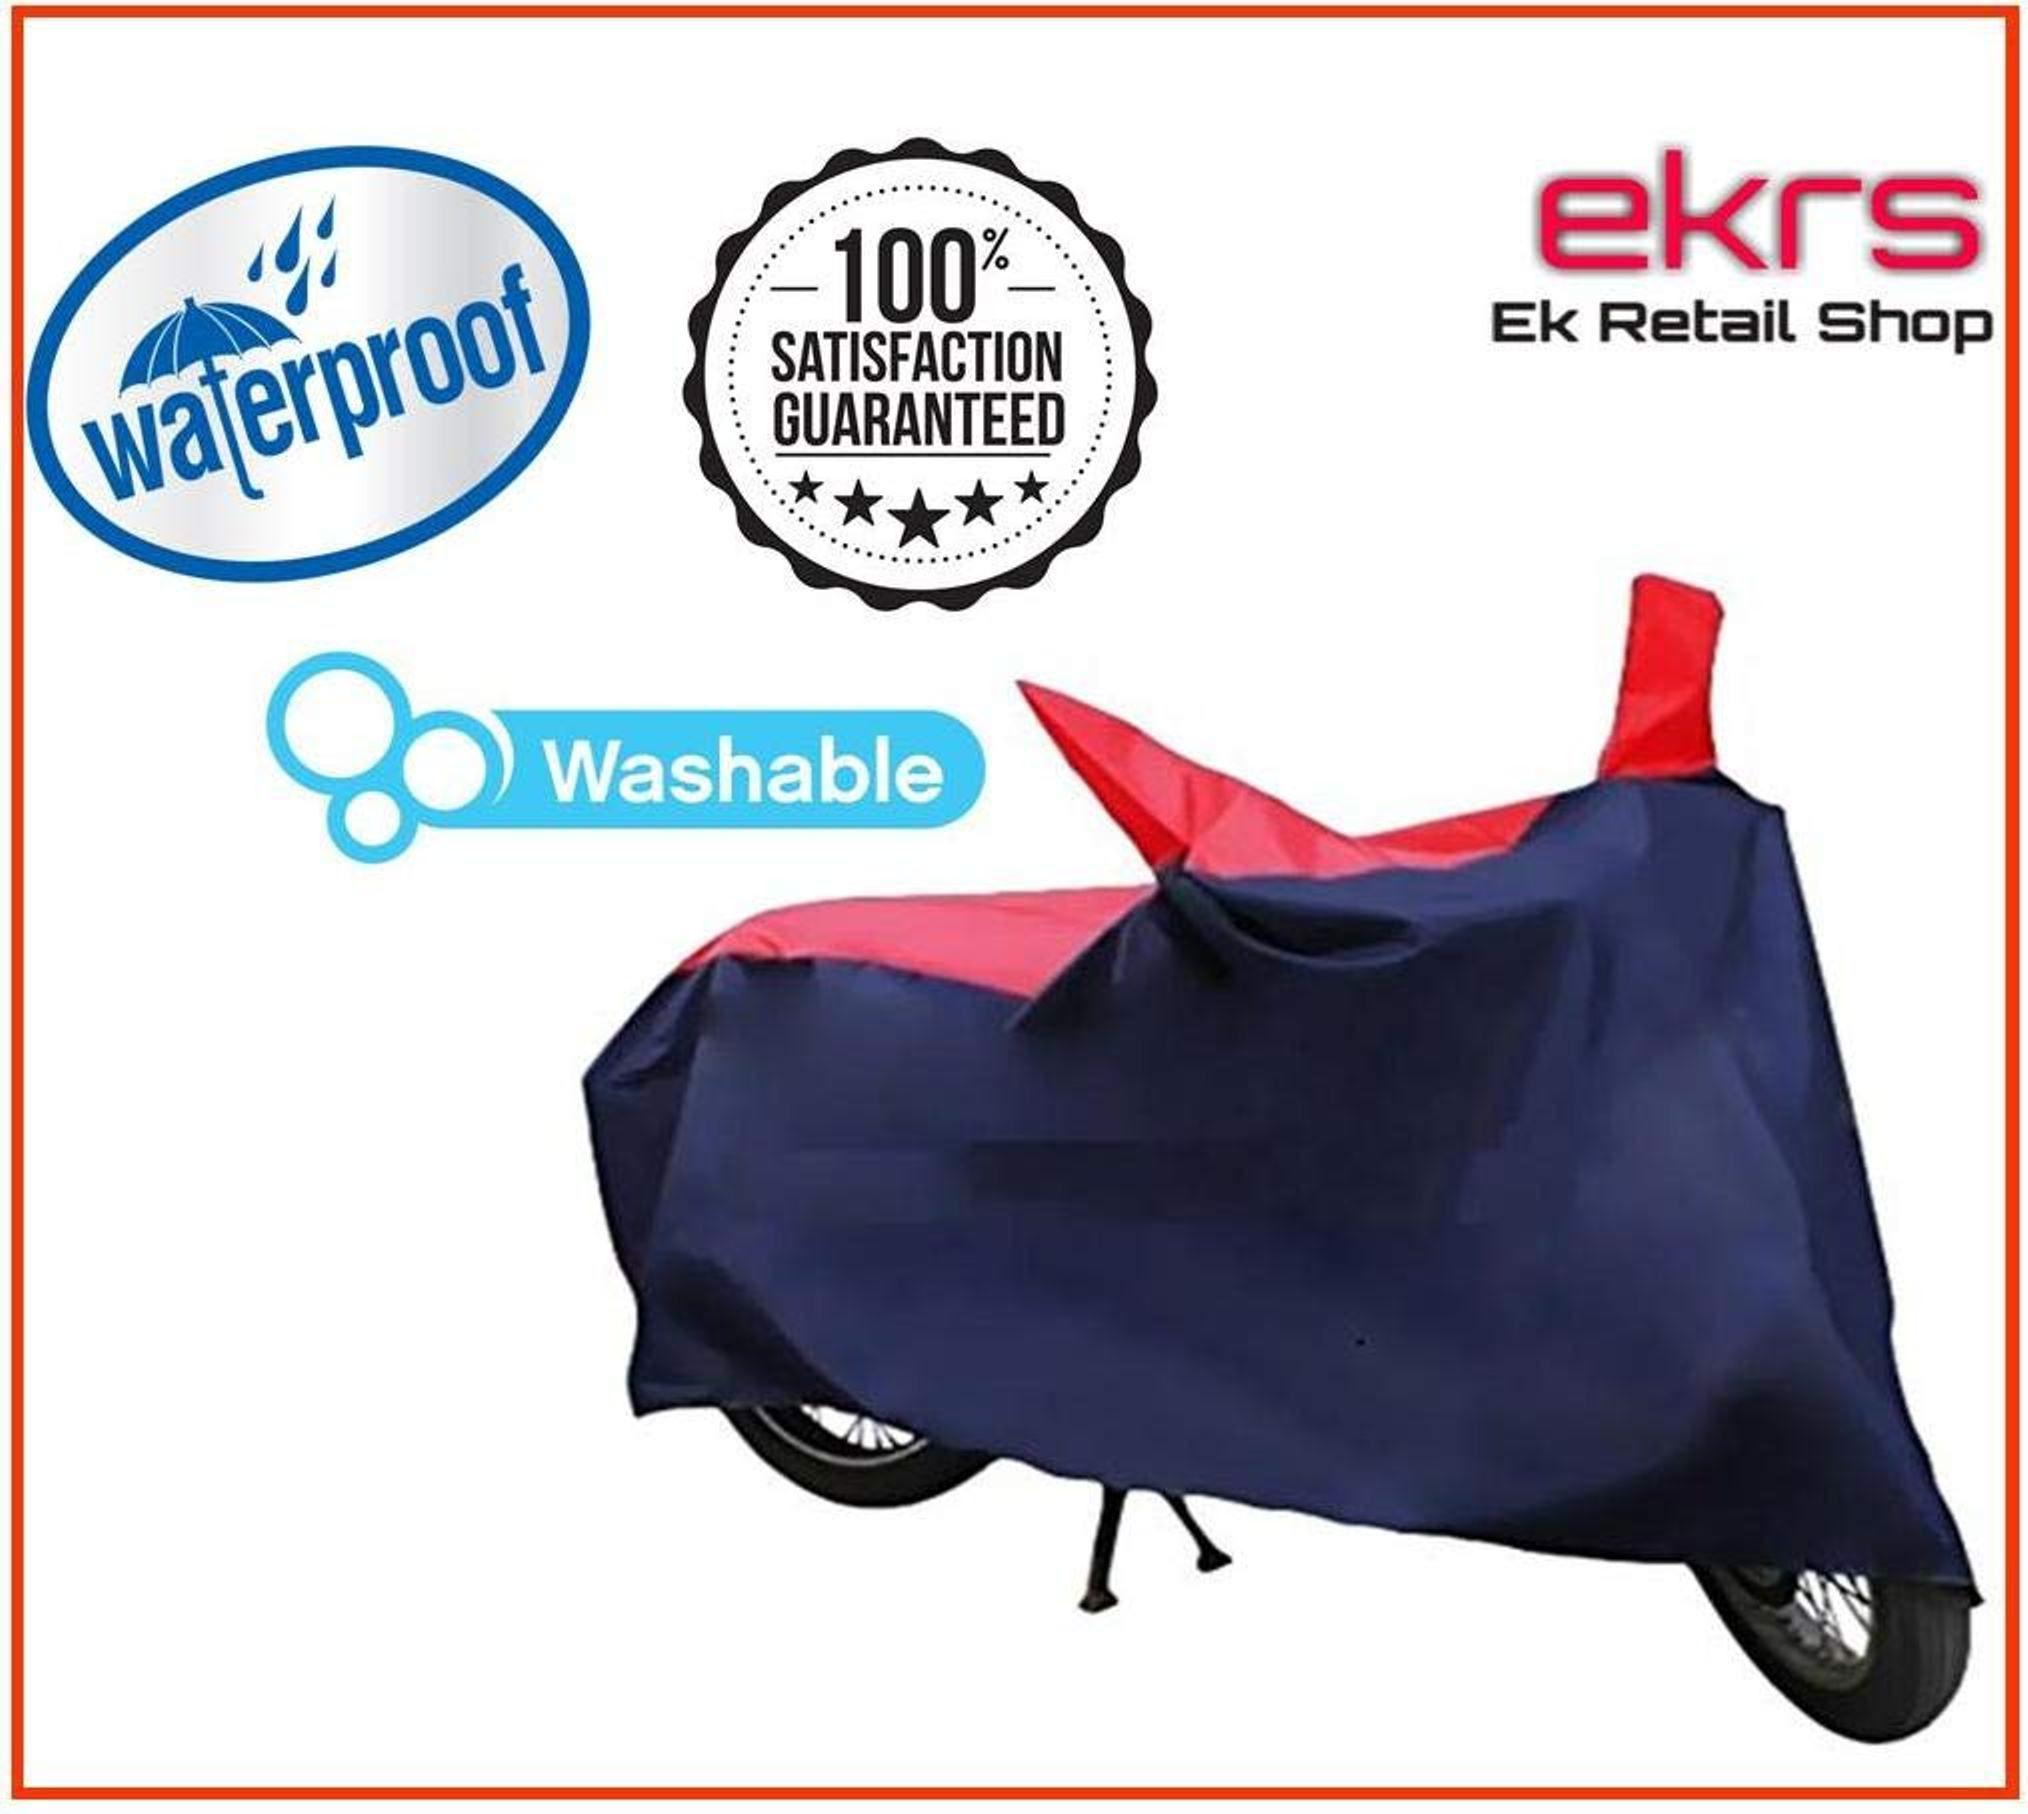 Ek Retail Shop Silver Matty Waterproof Bike Body Cover for Hero Splendor Pro(Black Alloy)